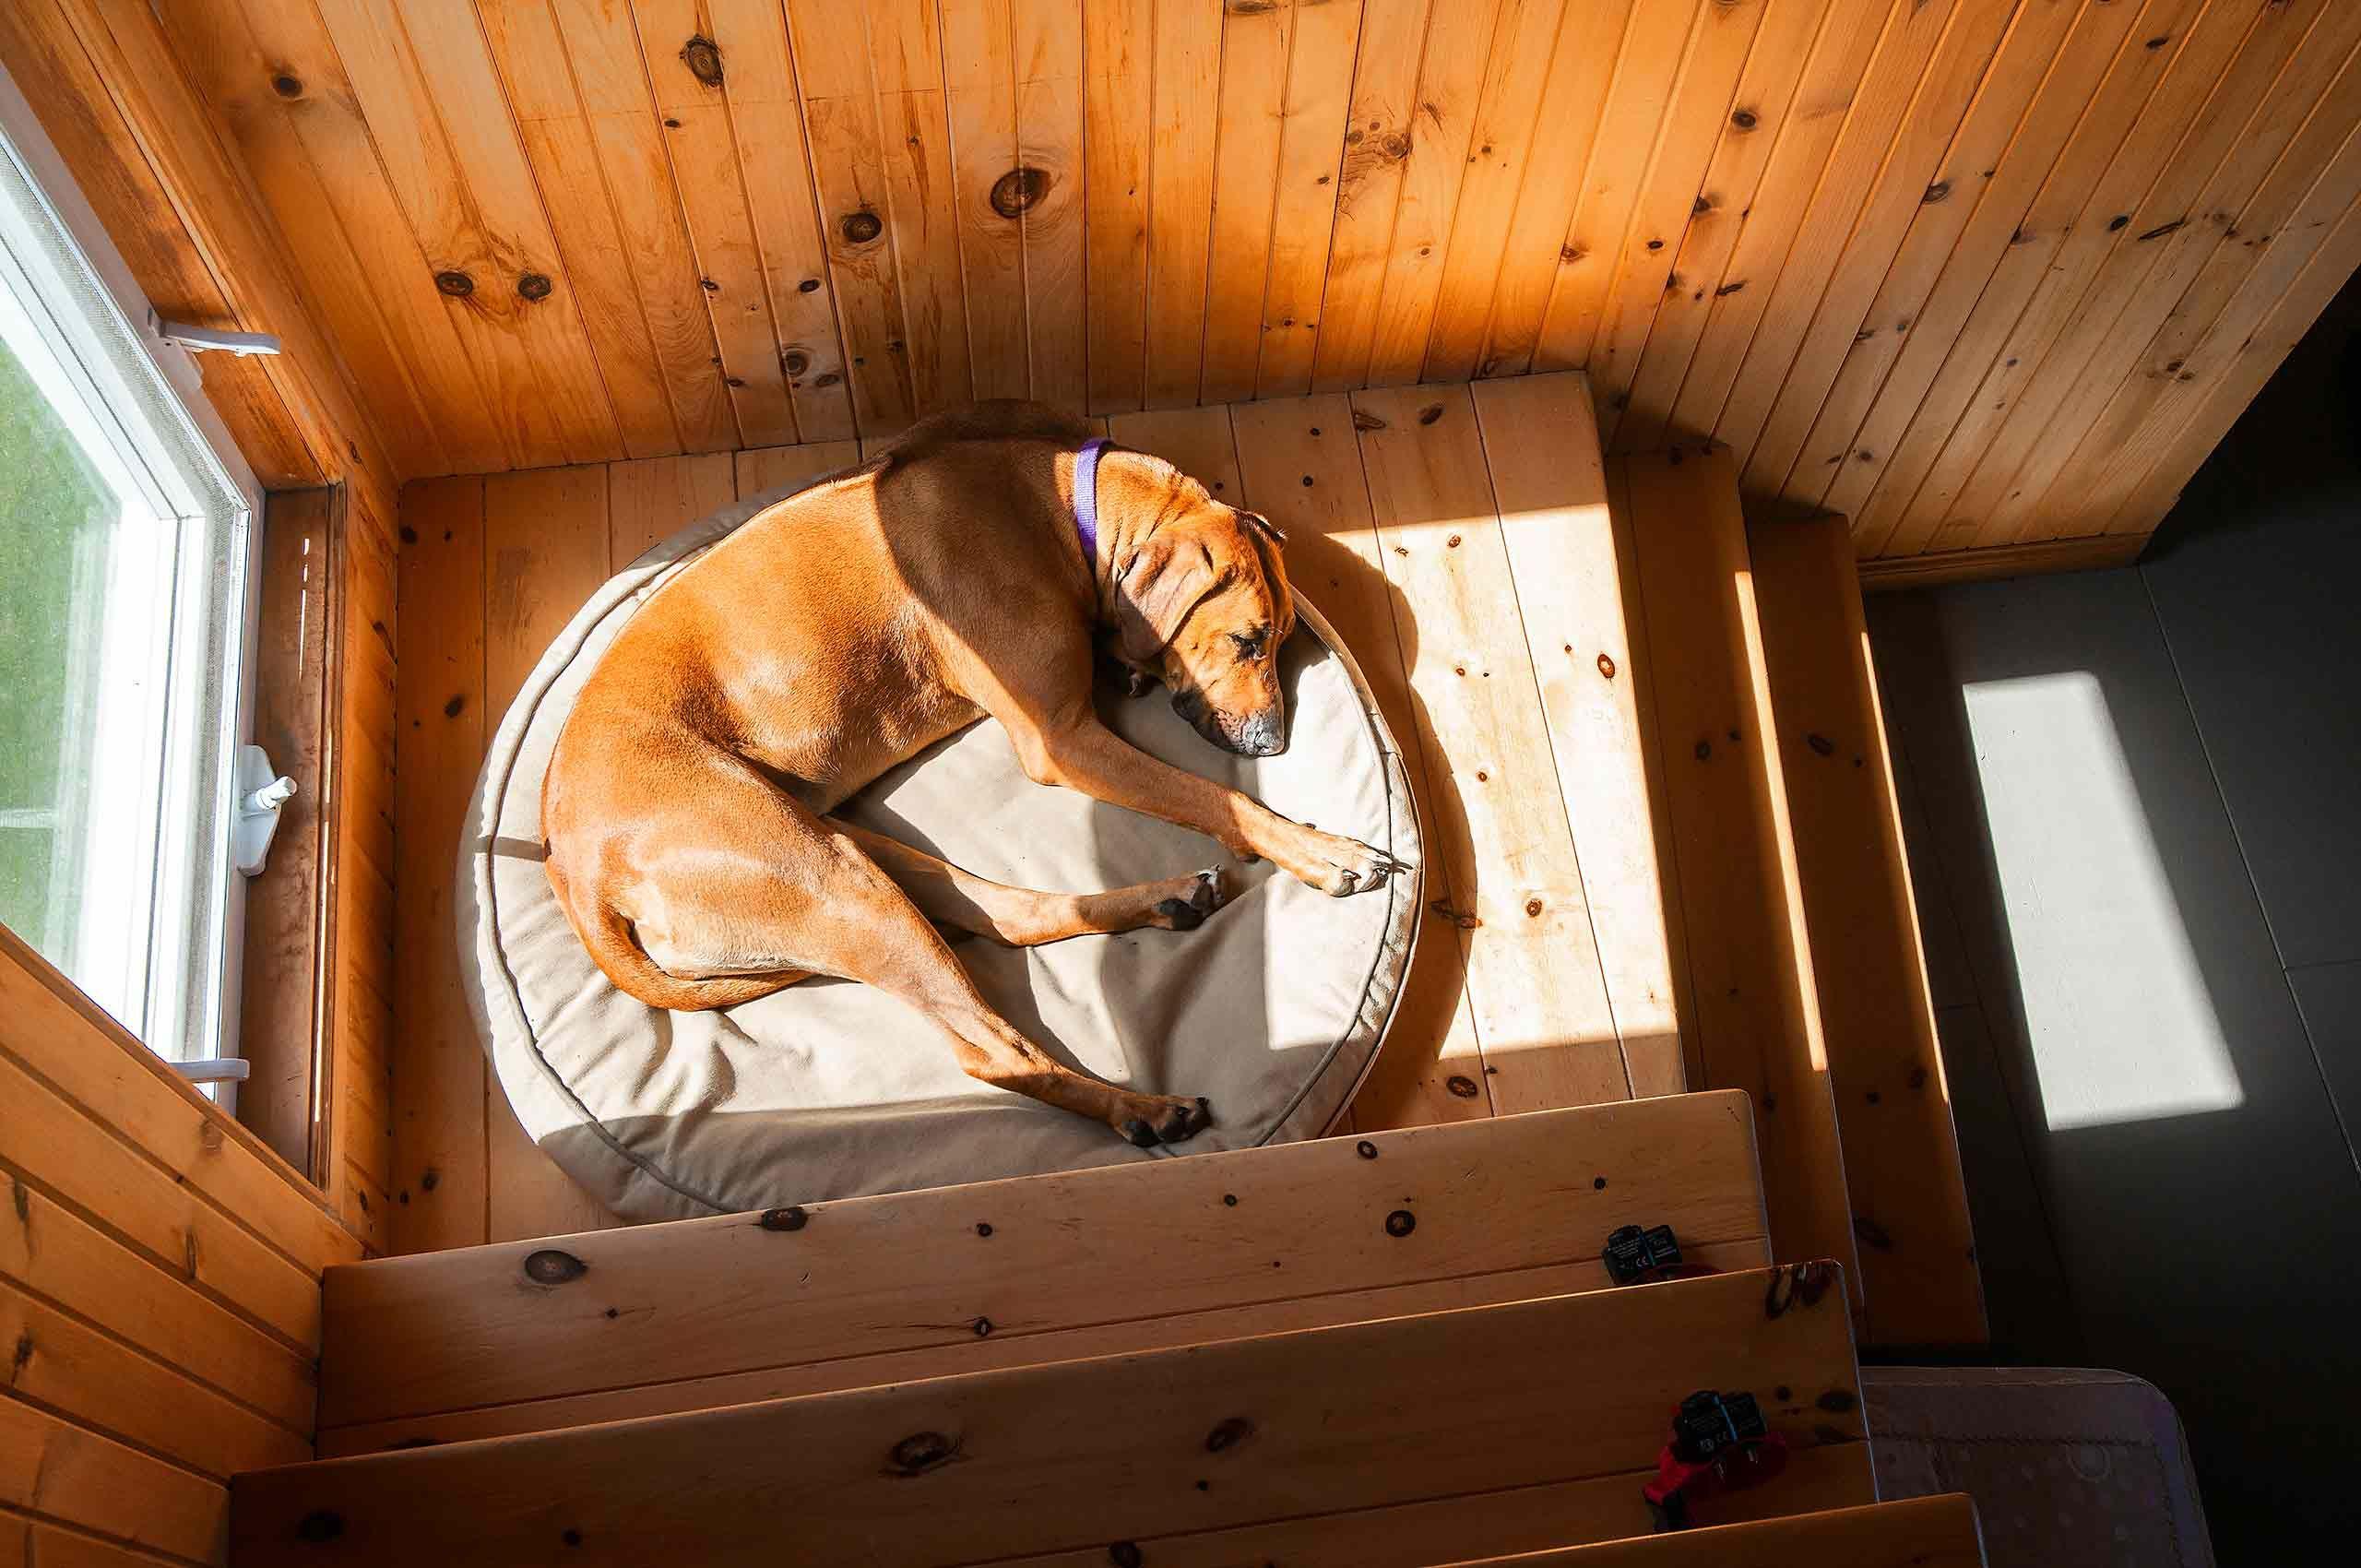 Sleeping ridgeback dog on stairs in les iles de madeleine quebec sunlight